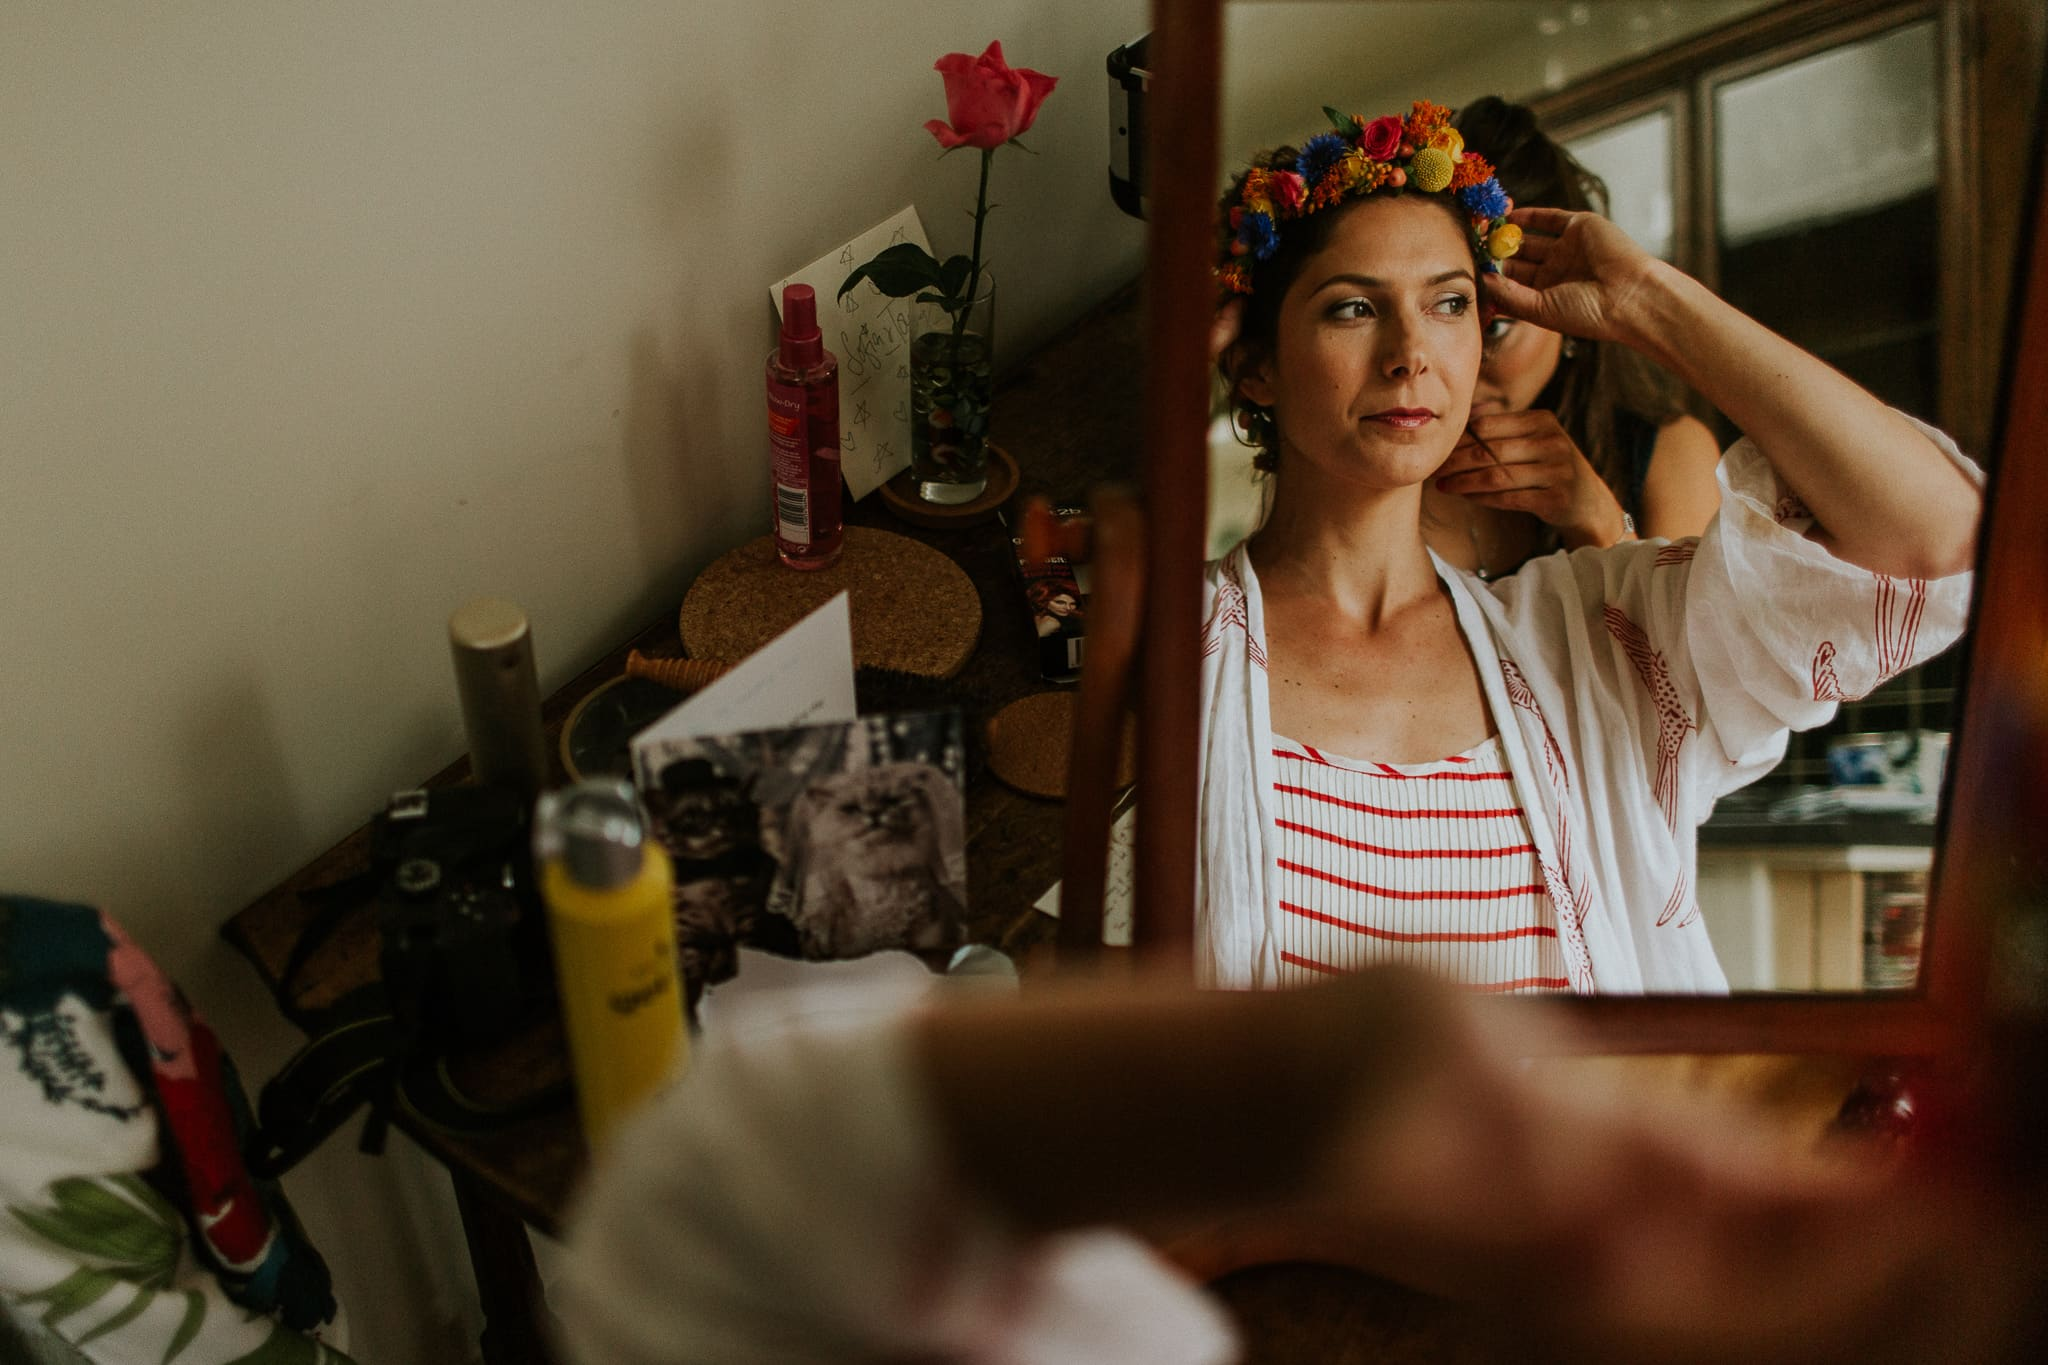 bride adjusting her hair piece in mirror